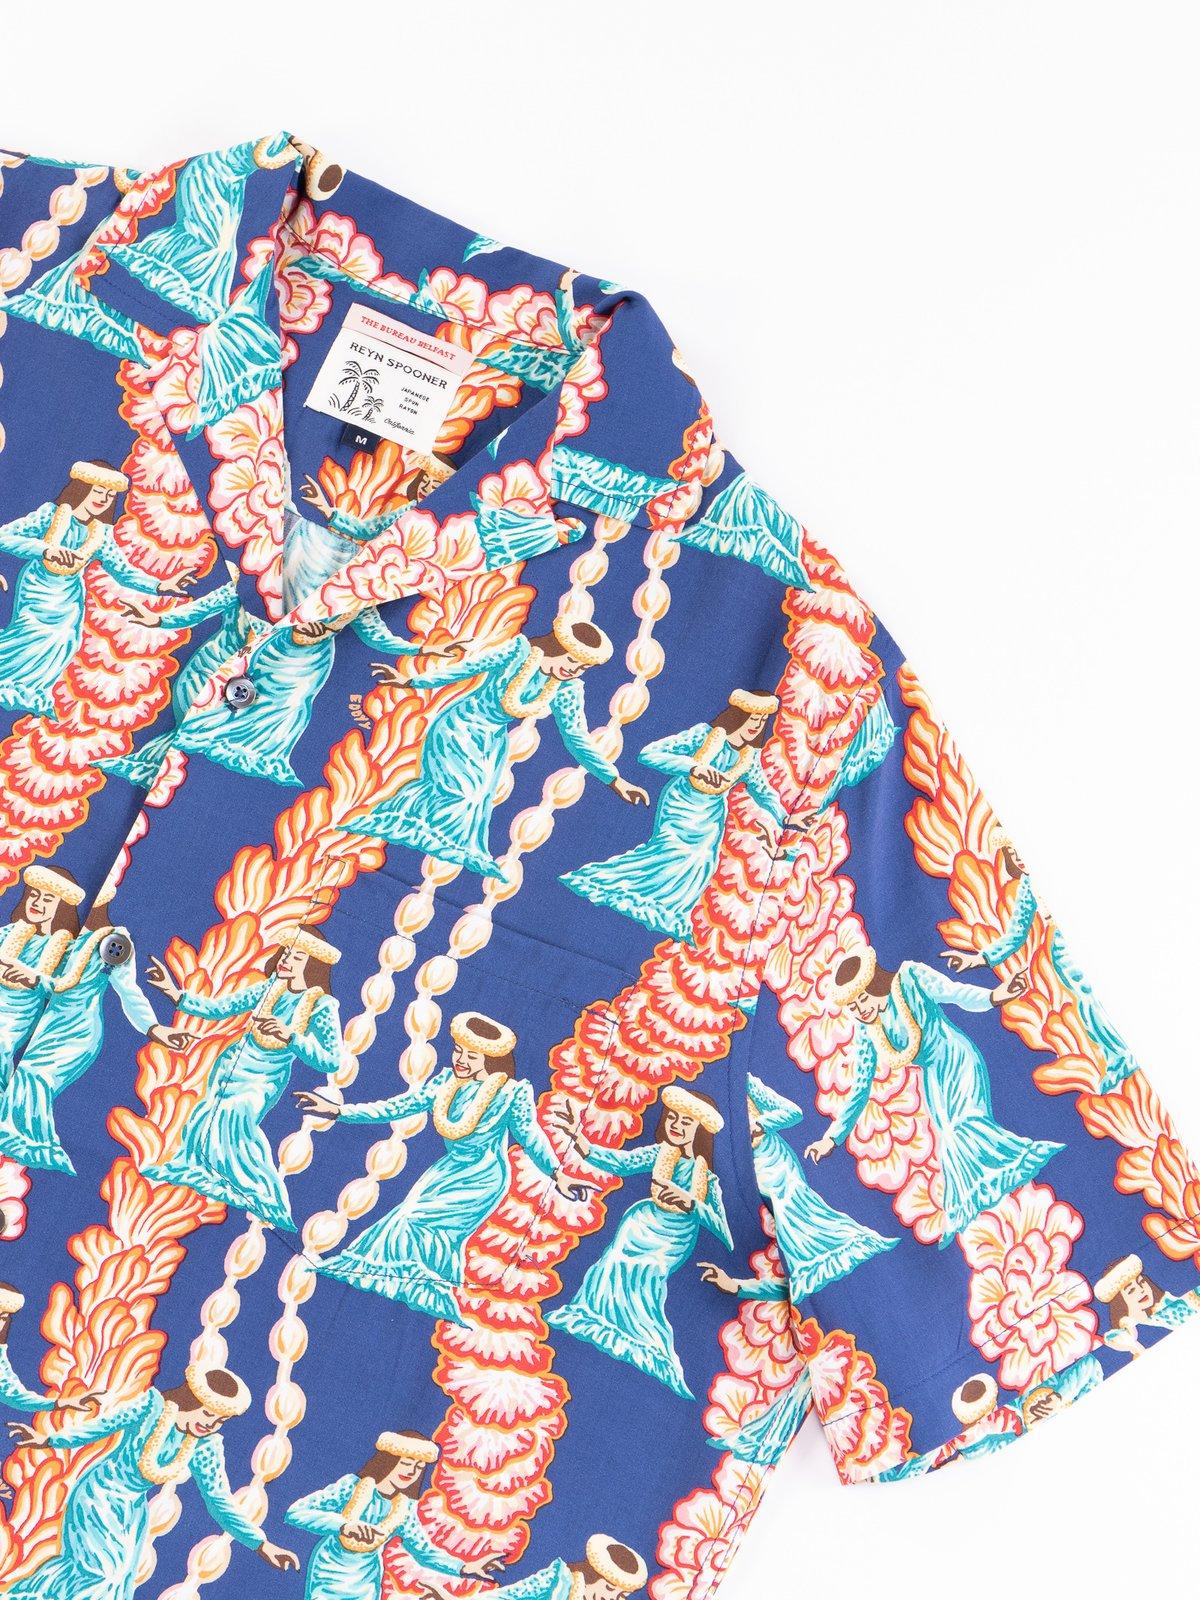 Navy Hula Auana Rayon Camp Shirt - Image 5